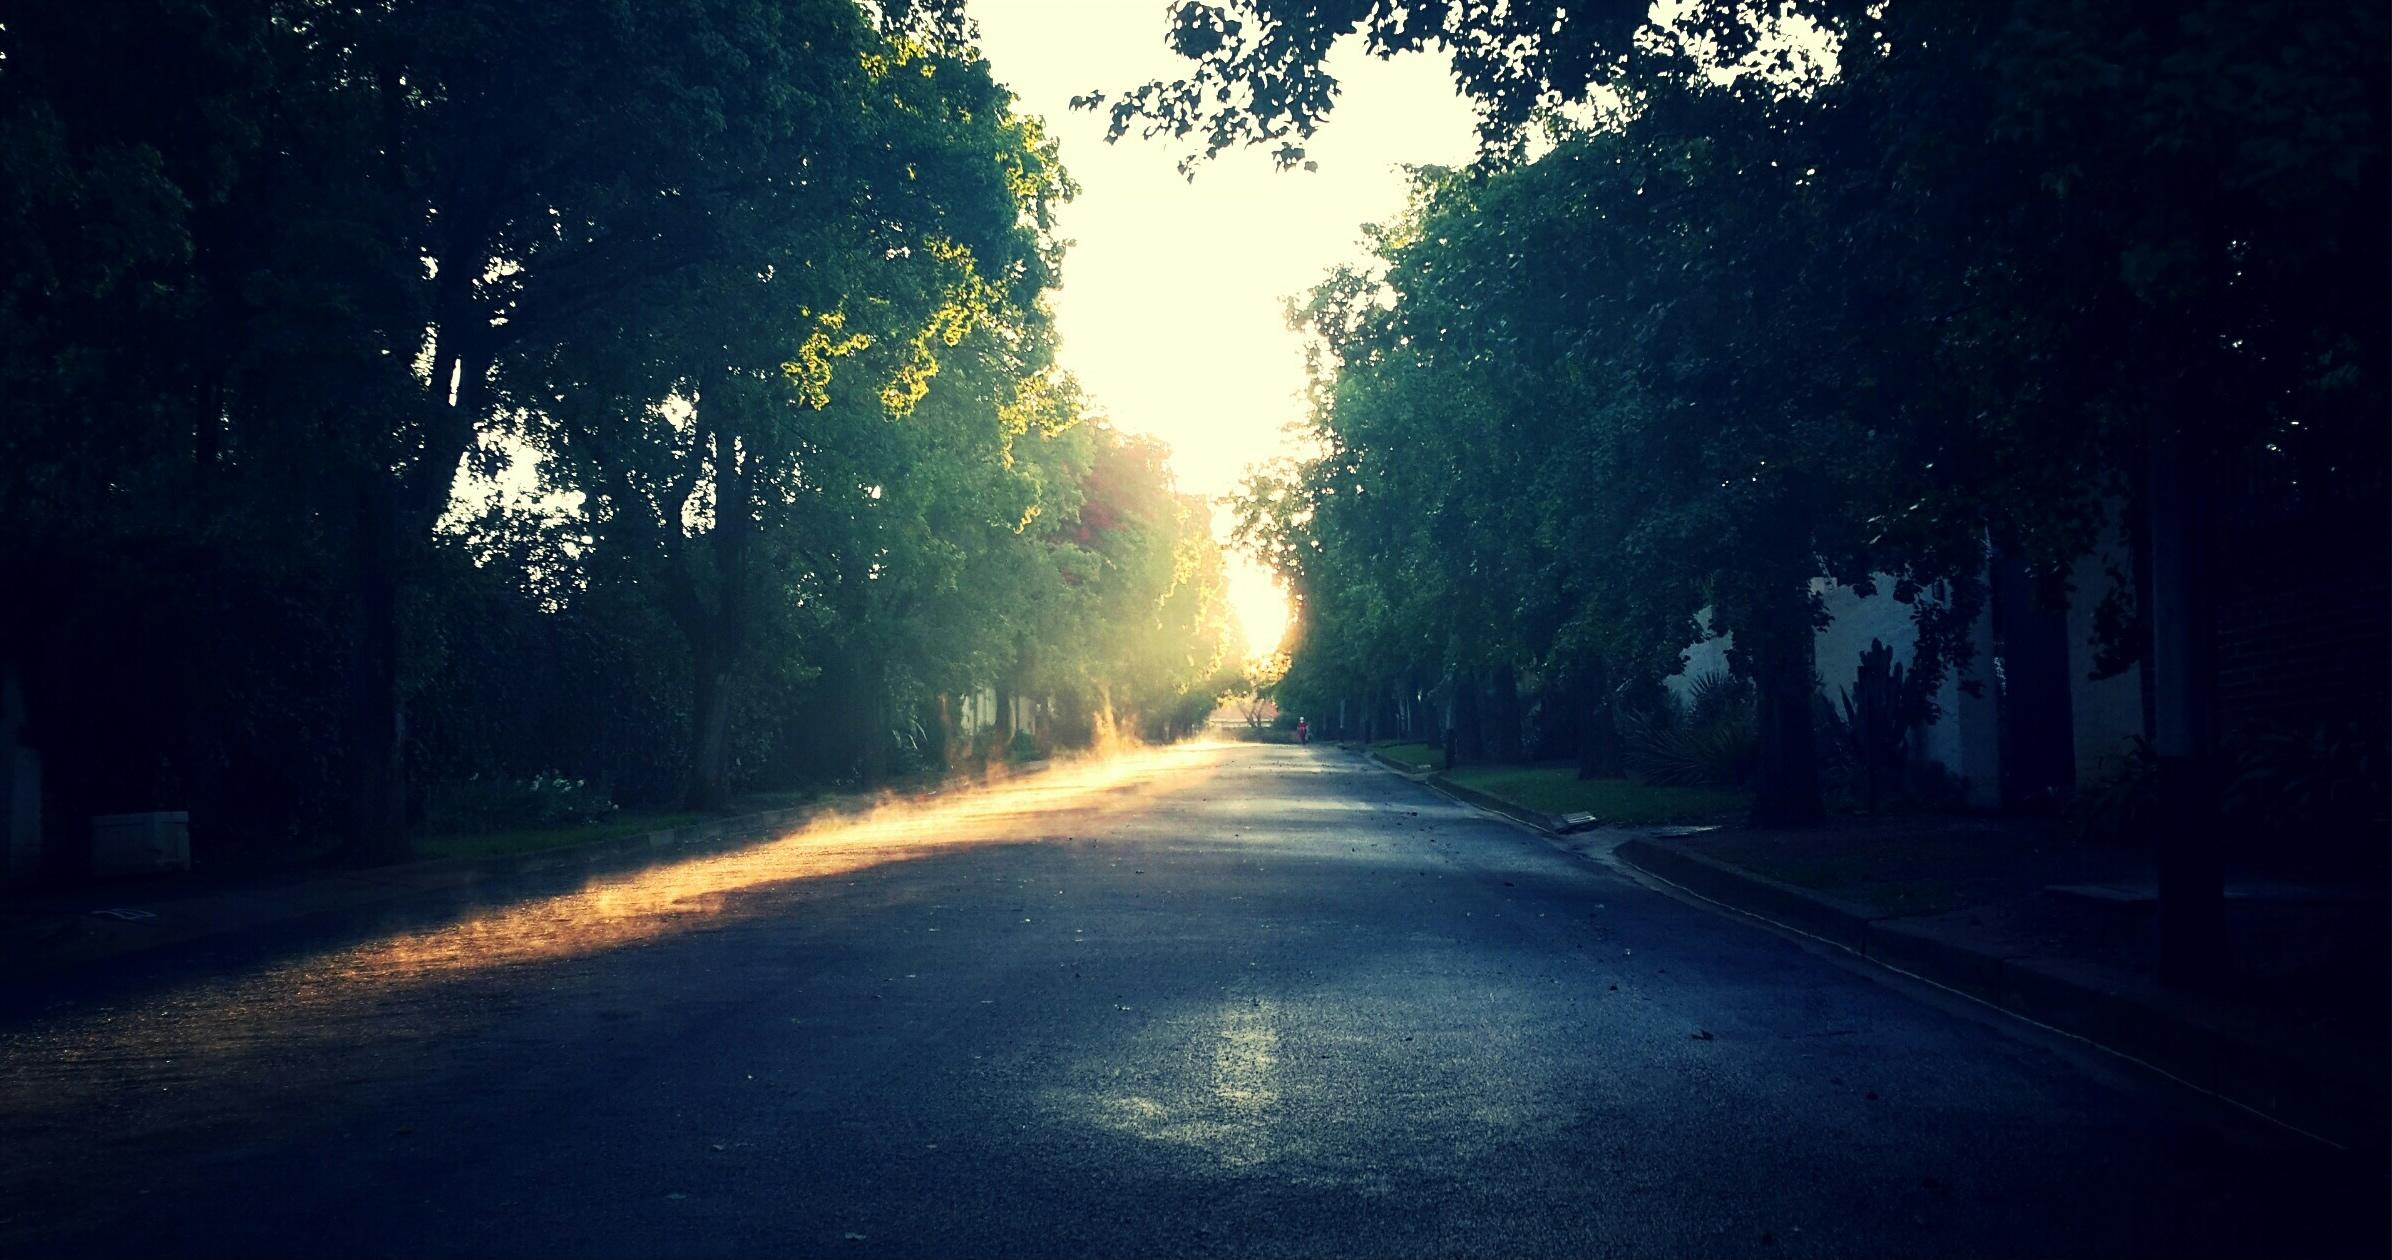 Tree Nature Forest Light Sun Fog Sunrise Road Mist Street Night Sunlight Morning Dawn Atmosphere Dusk